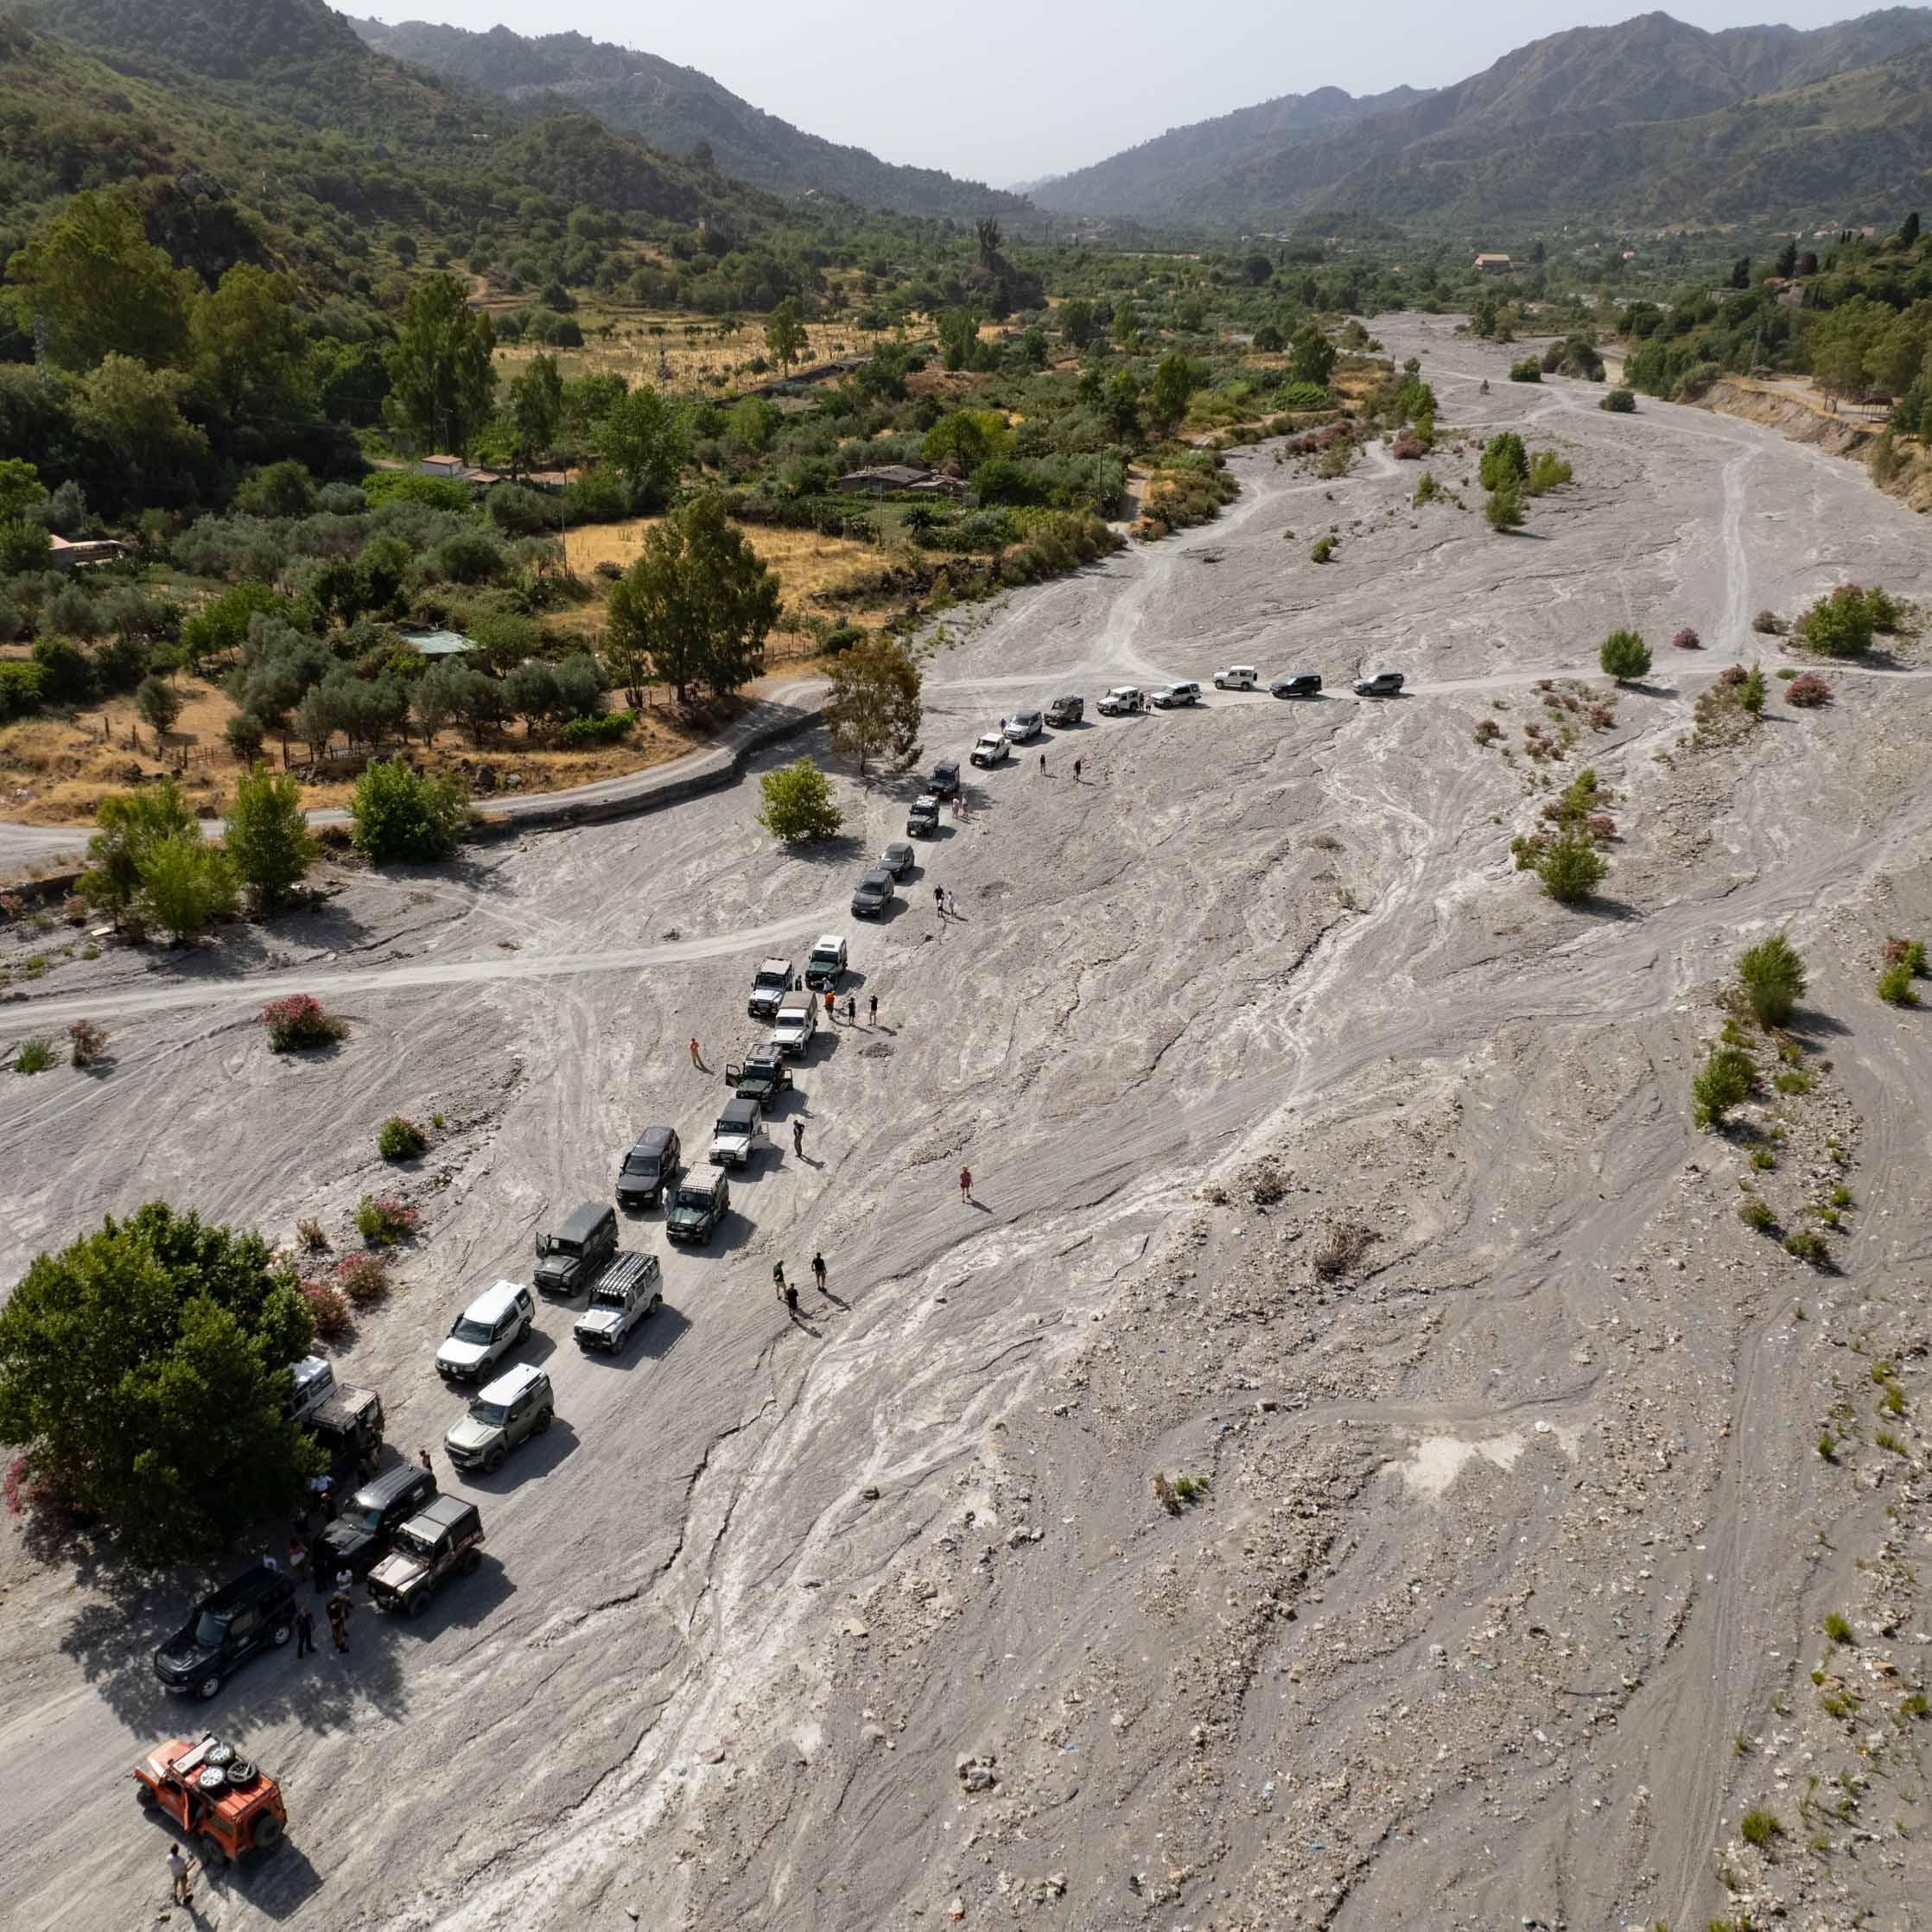 Land_Rover_Tour_Sicilia_2021_Land_Rover_Experience_Italia_